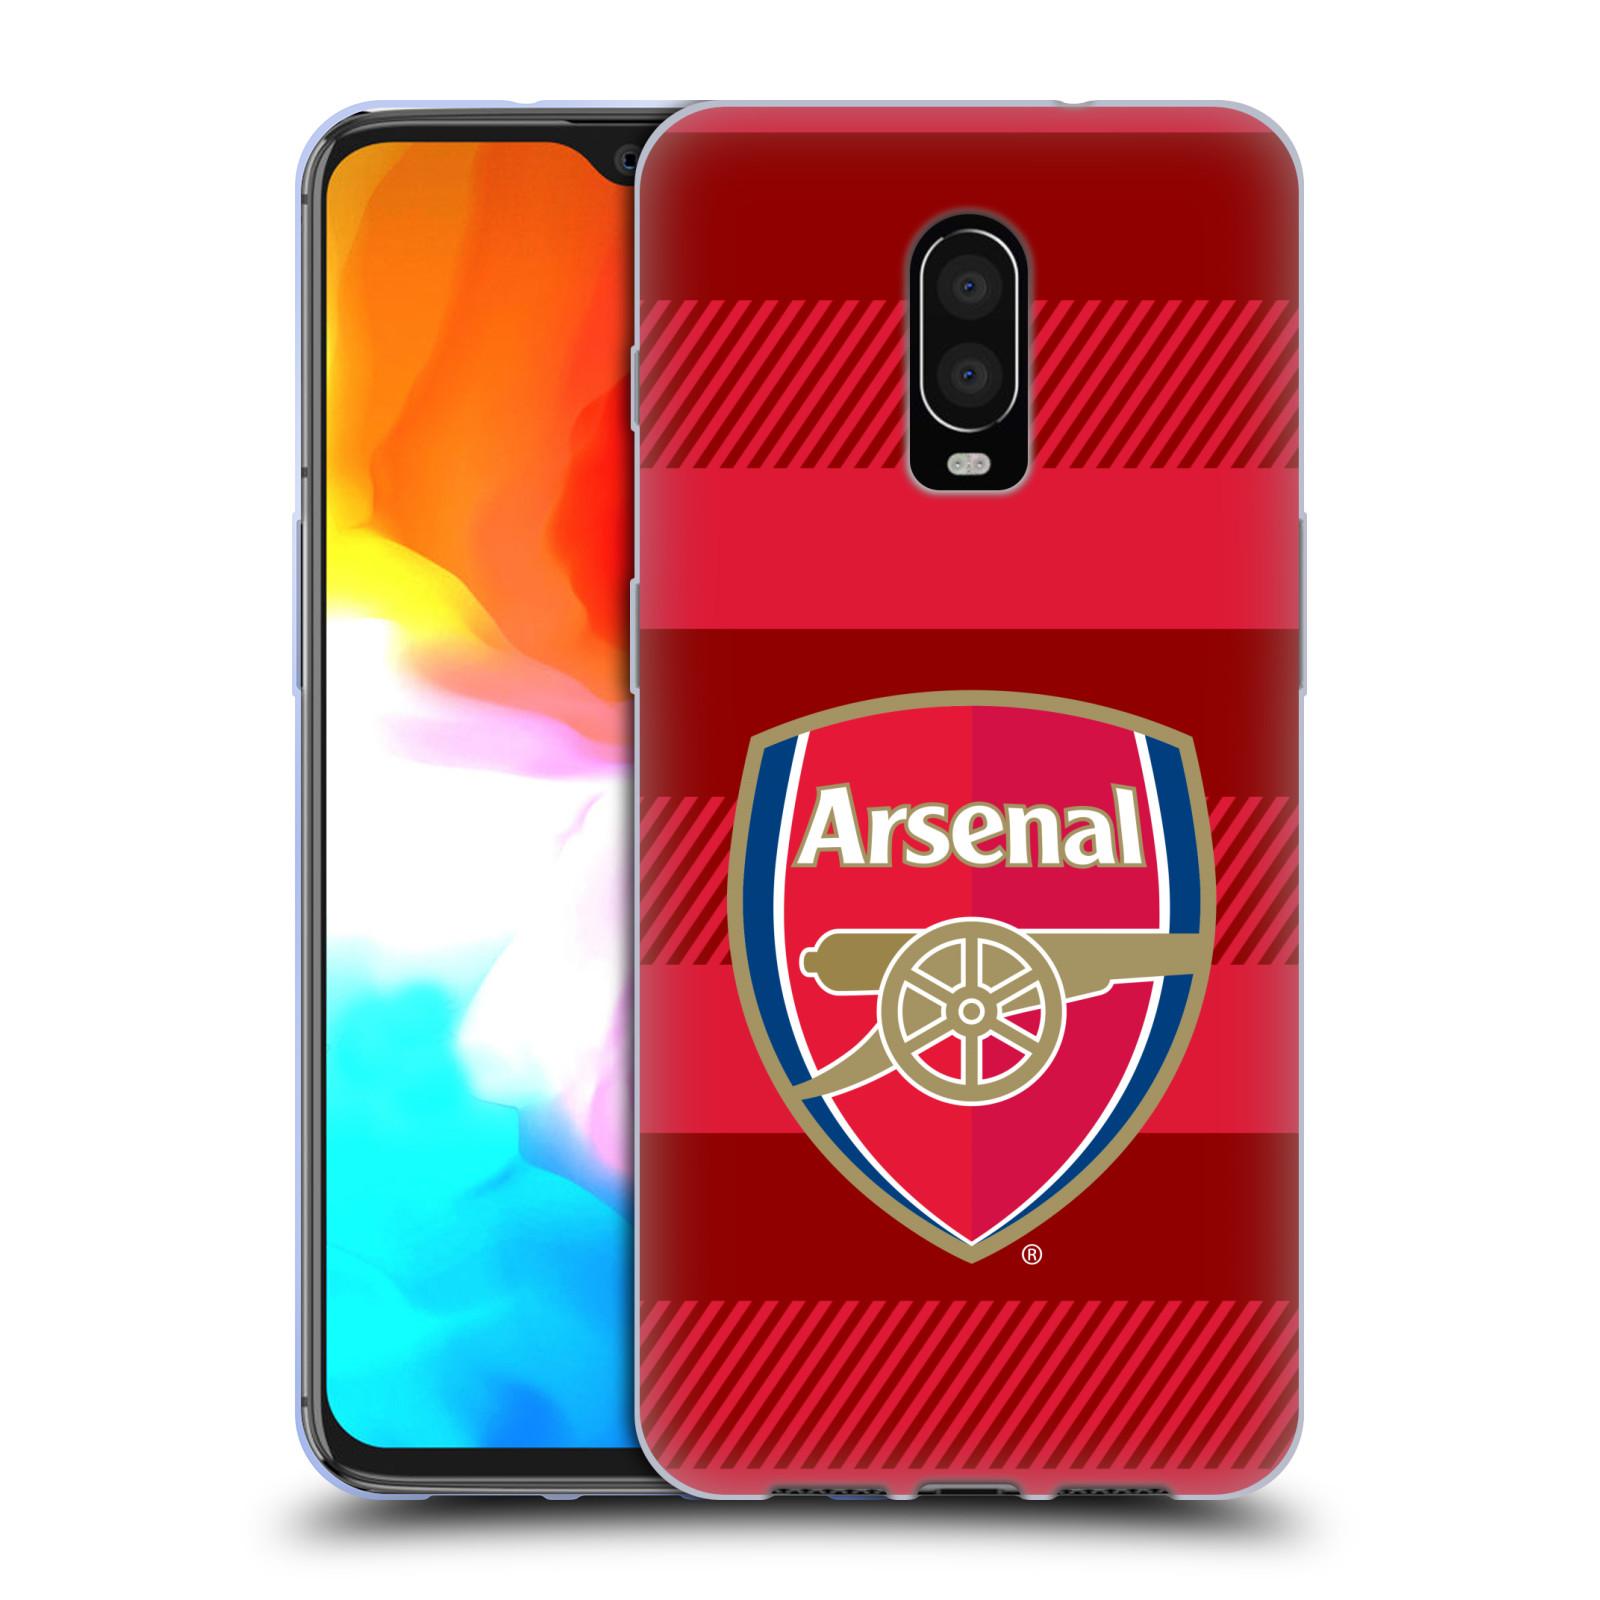 Silikonové pouzdro na mobil OnePlus 6T - Head Case - Arsenal FC - Logo s pruhy